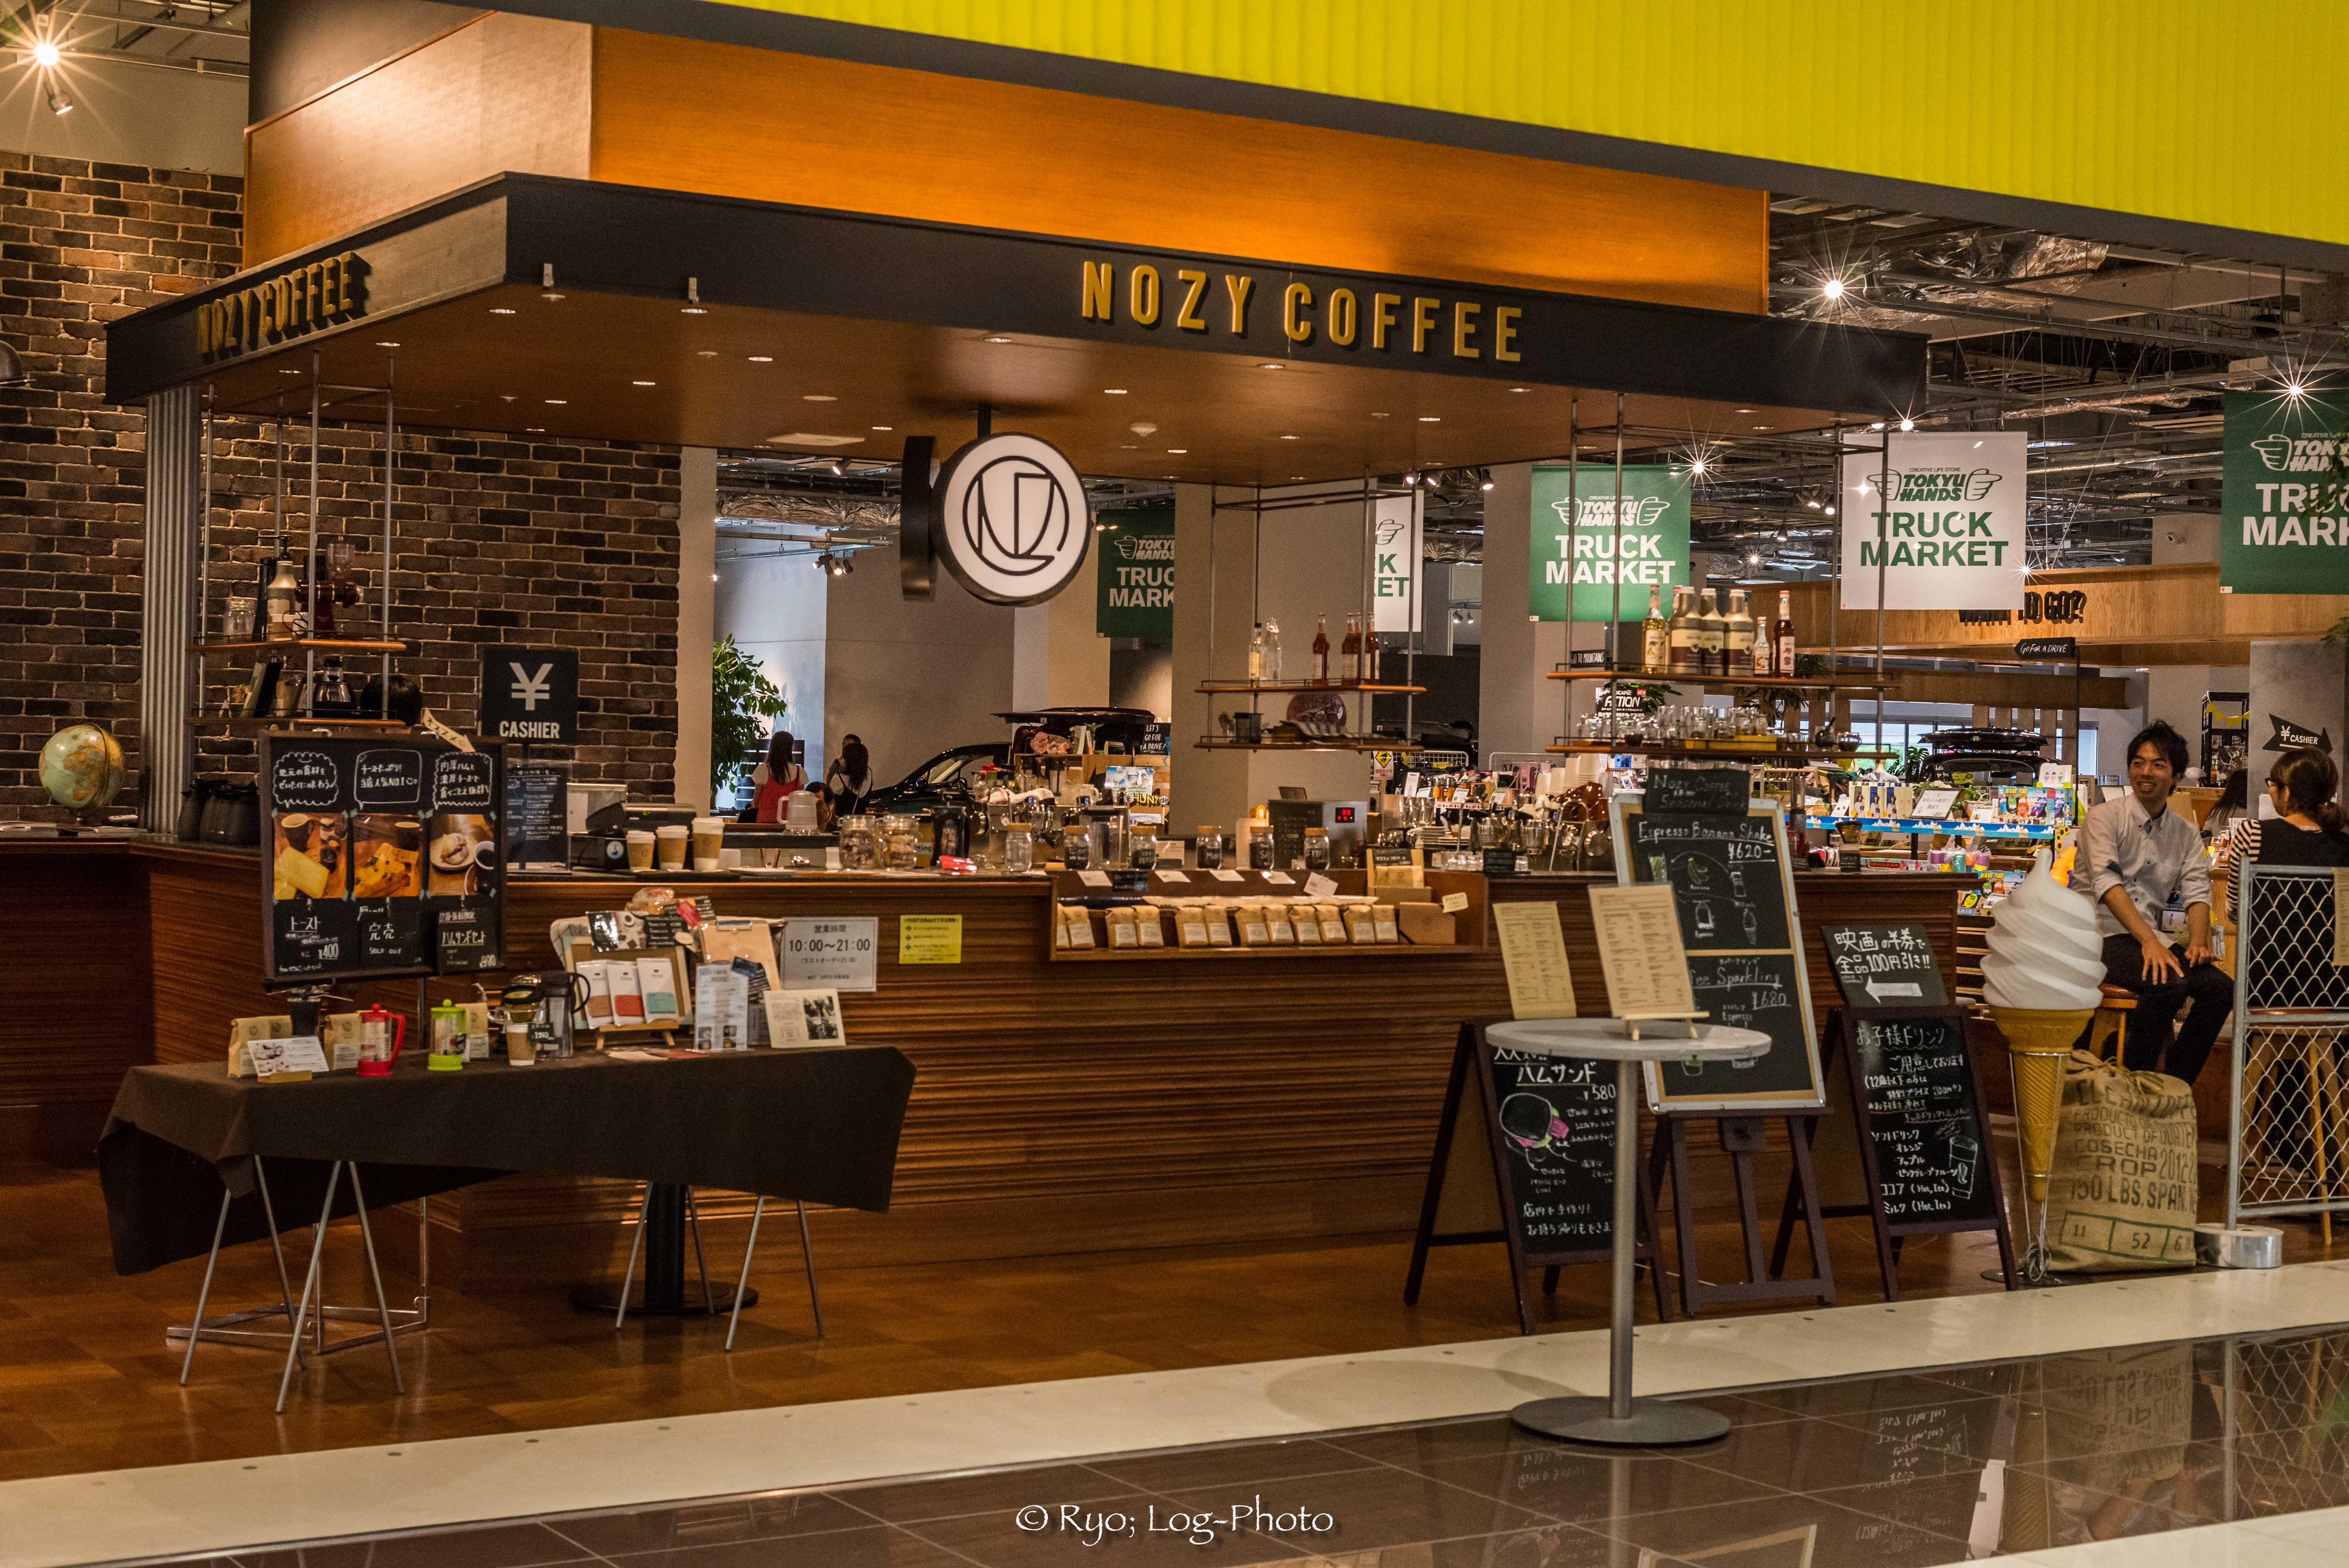 nozycoffeeノージーコーヒー木更津 雰囲気 カフェ